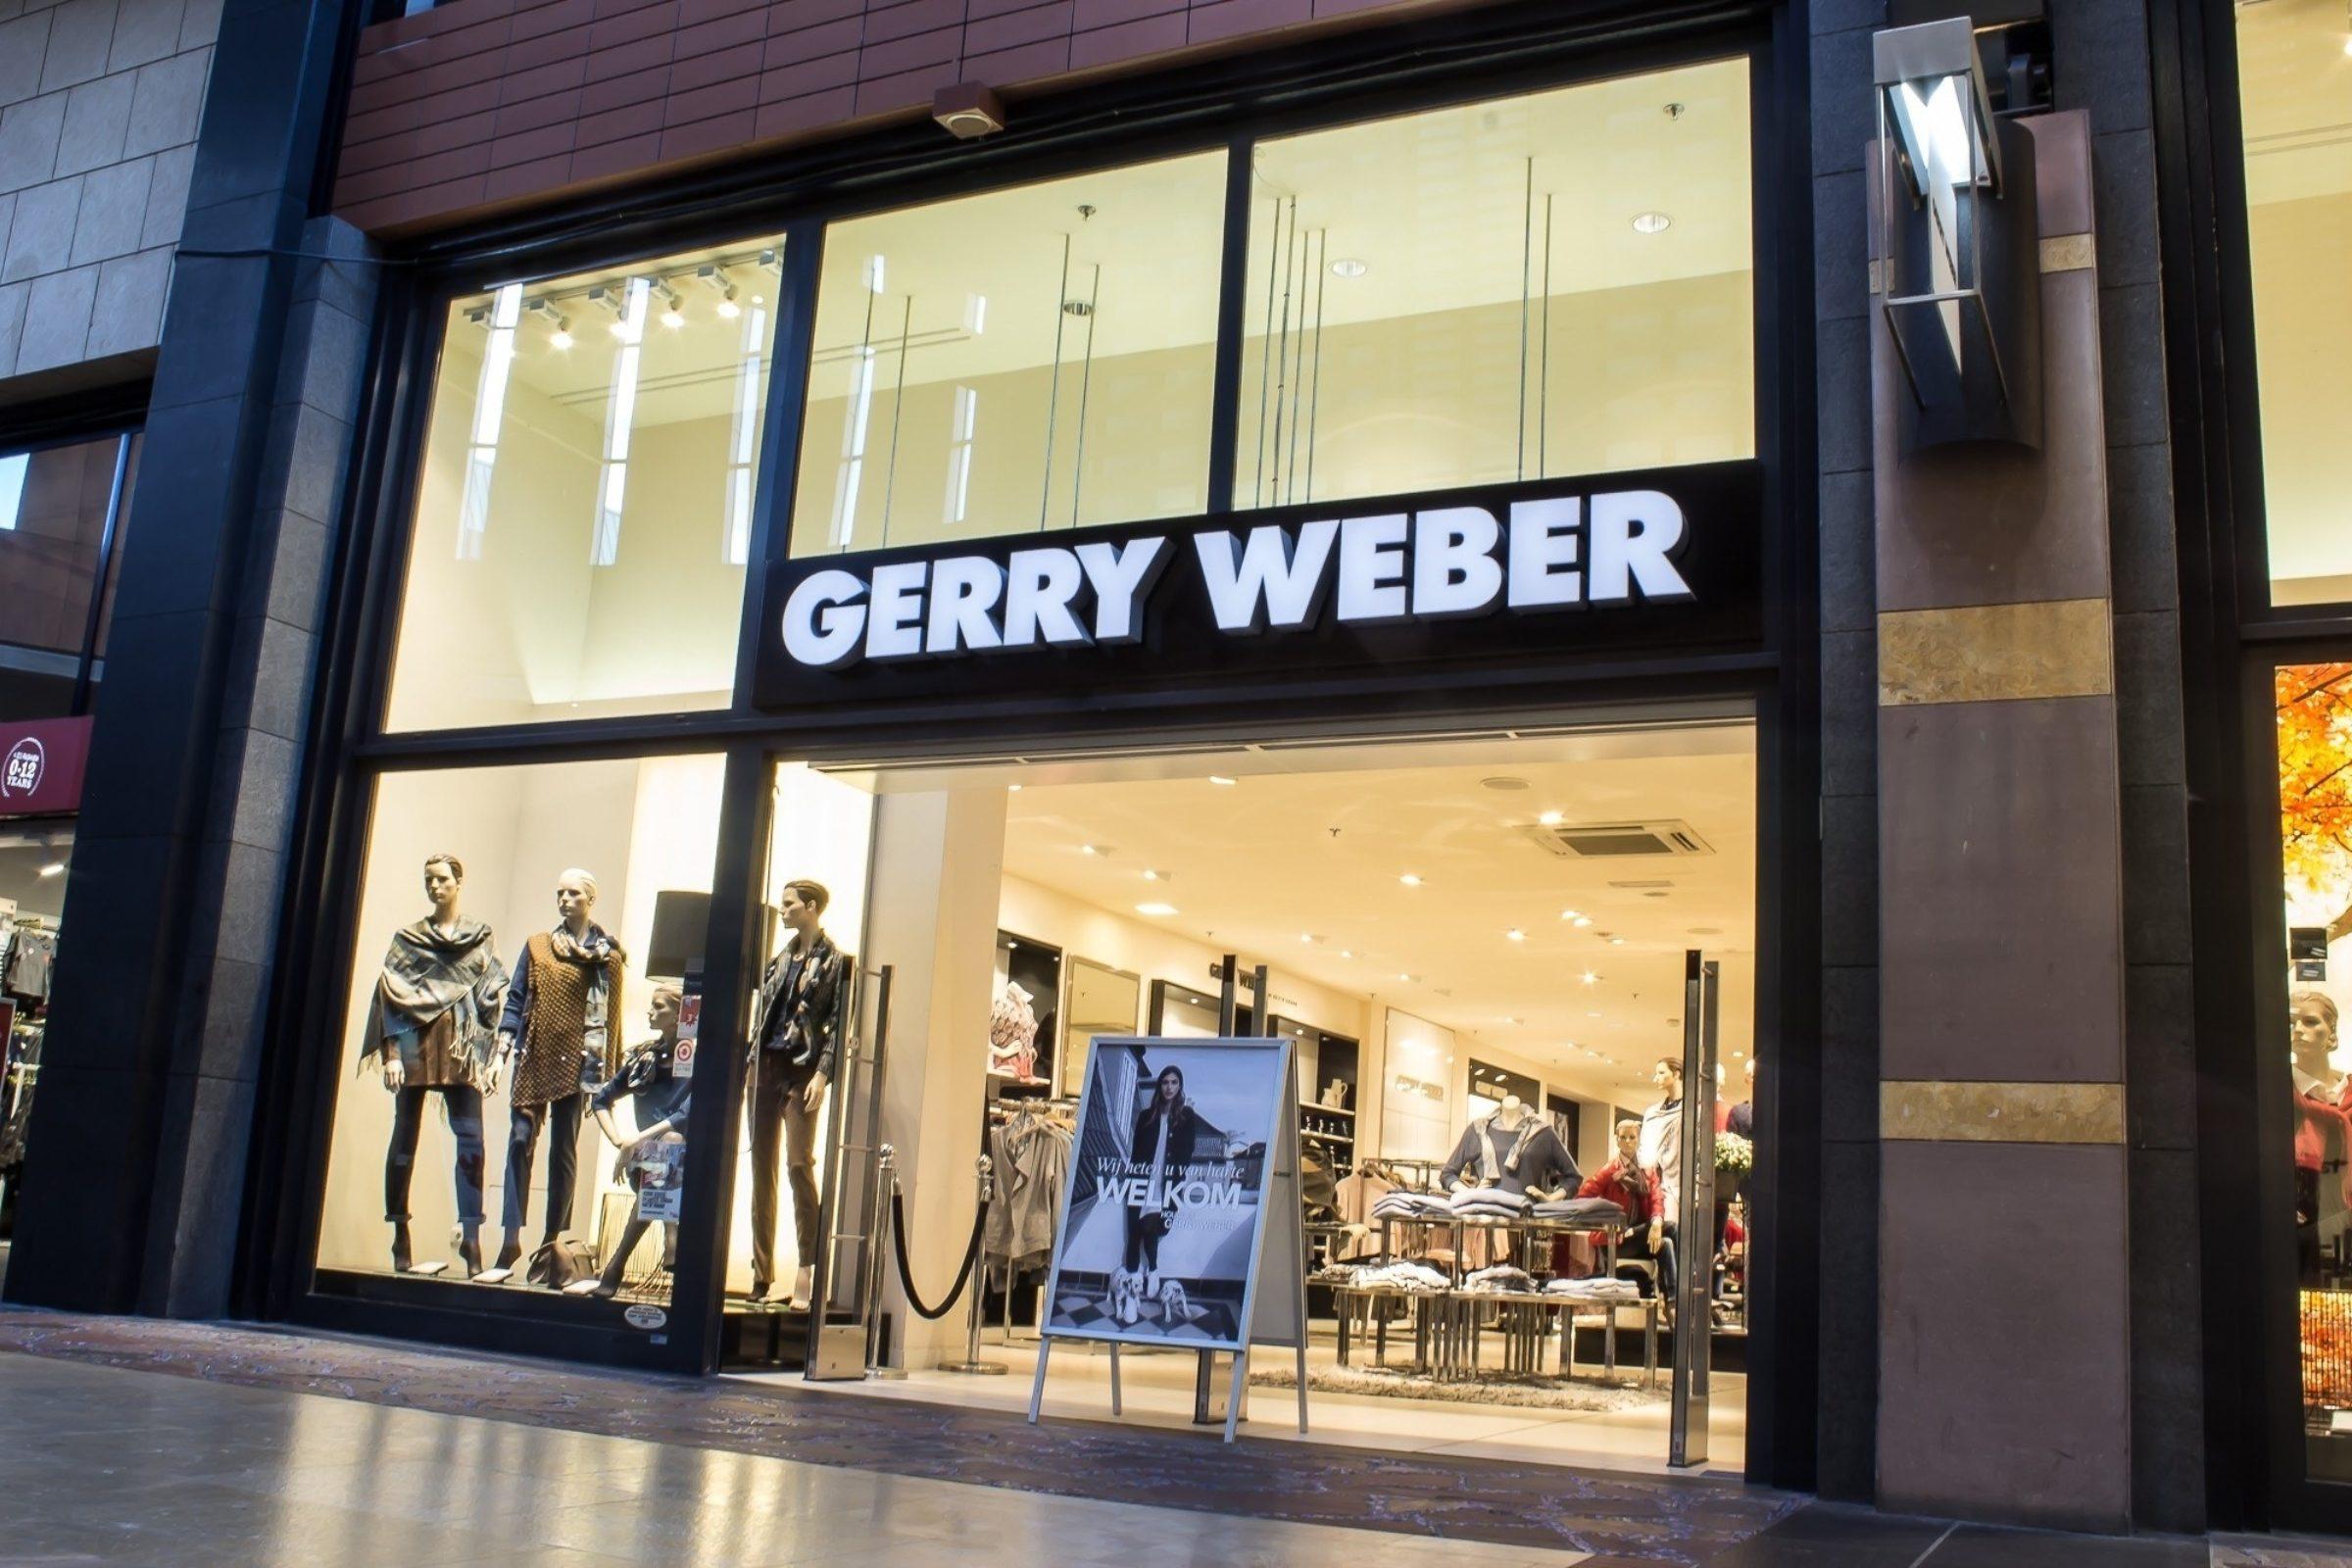 Gerryweber 1505 1538748238 35ht4fn6jc